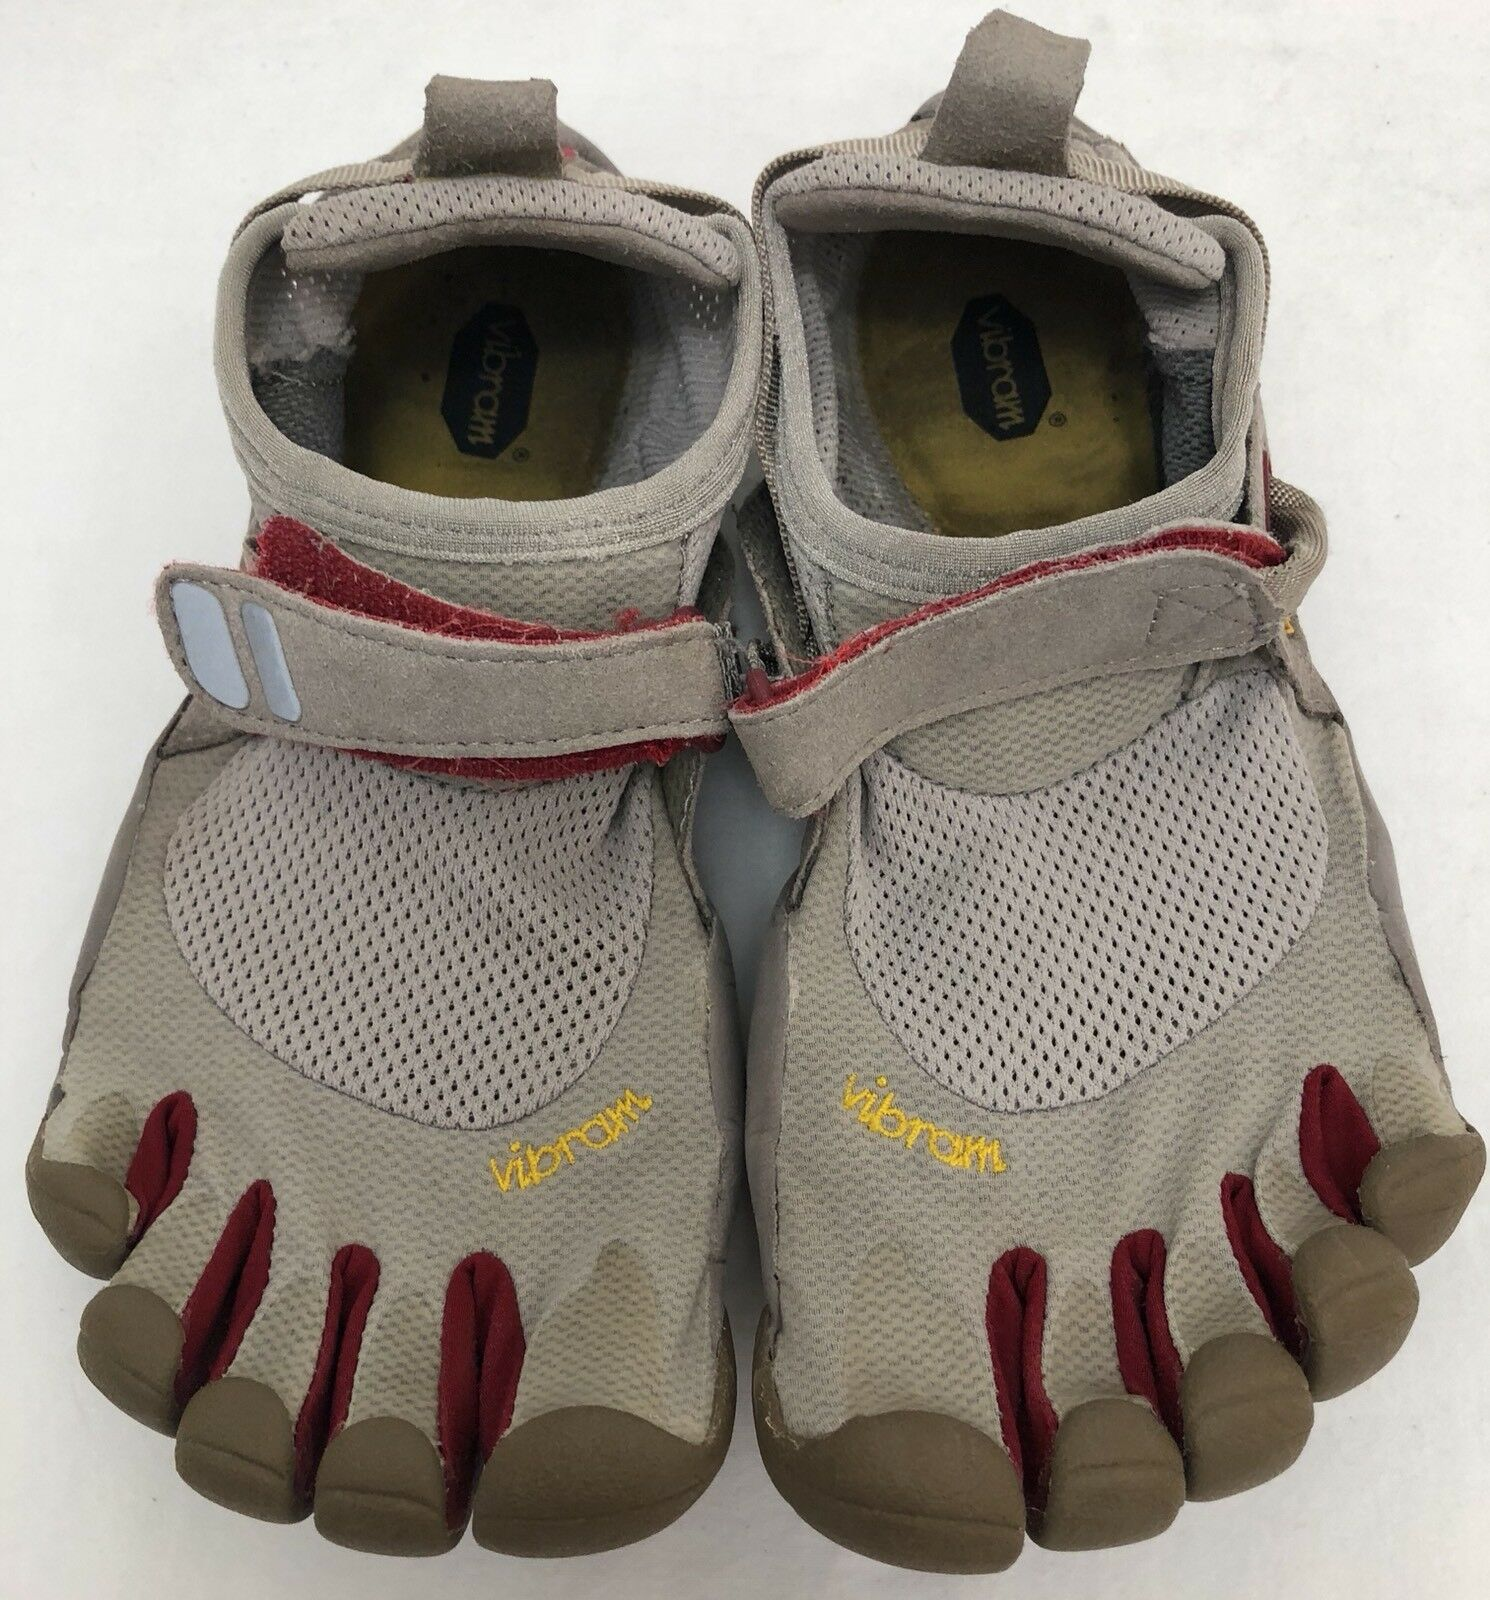 Womens VIBRAM FIVE FINGERS W4423 Barefoot Minimalist Running shoes 38 US 7-7.5